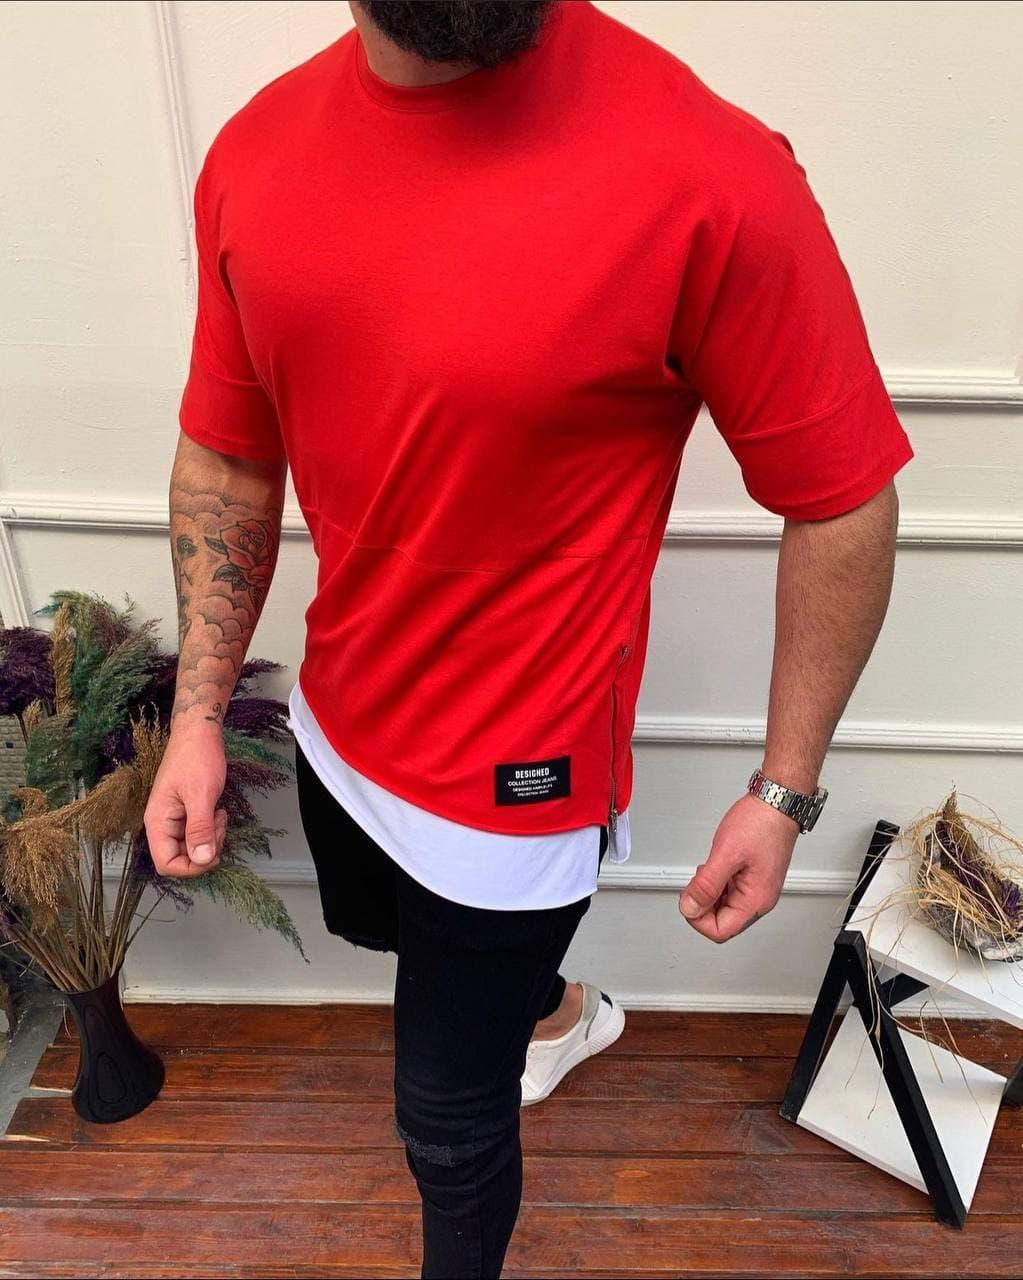 😜 Футболка - Мужская футболка оверсайз / футболка червона з замком збоку